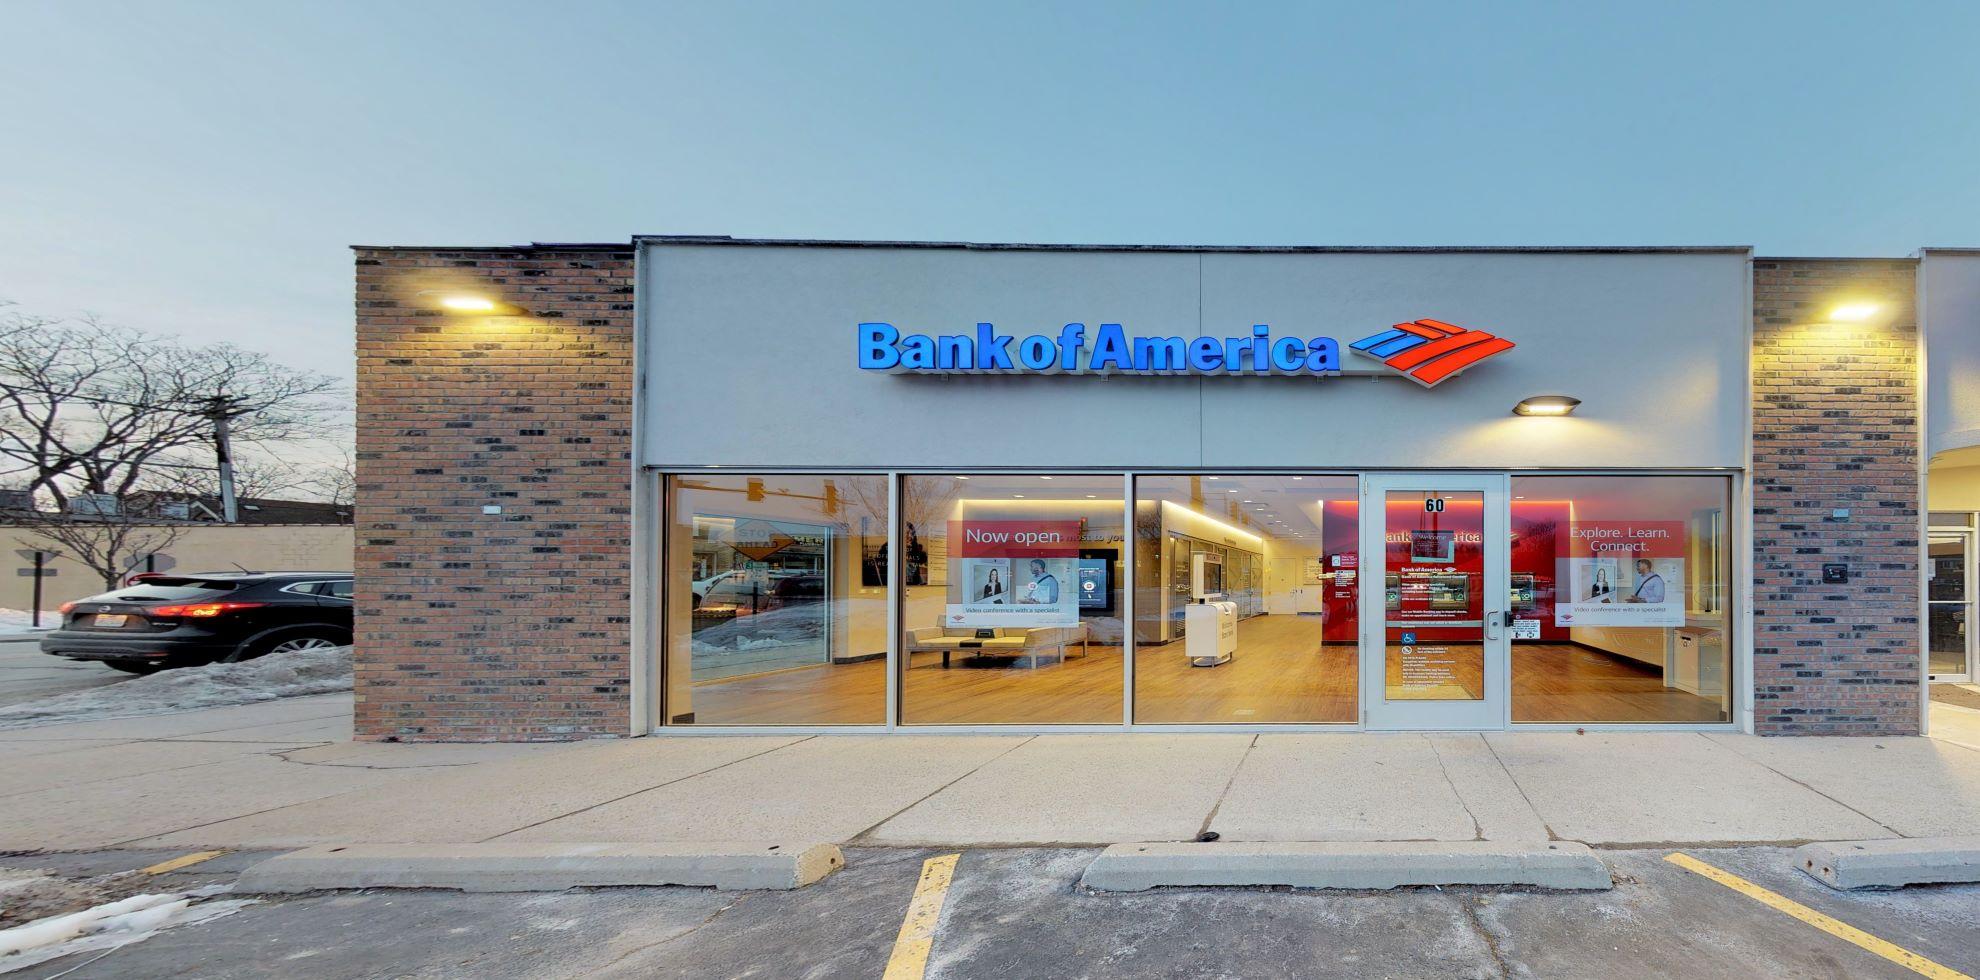 Bank of America Advanced Center with walk-up ATM   60 W Palatine Rd, Palatine, IL 60067